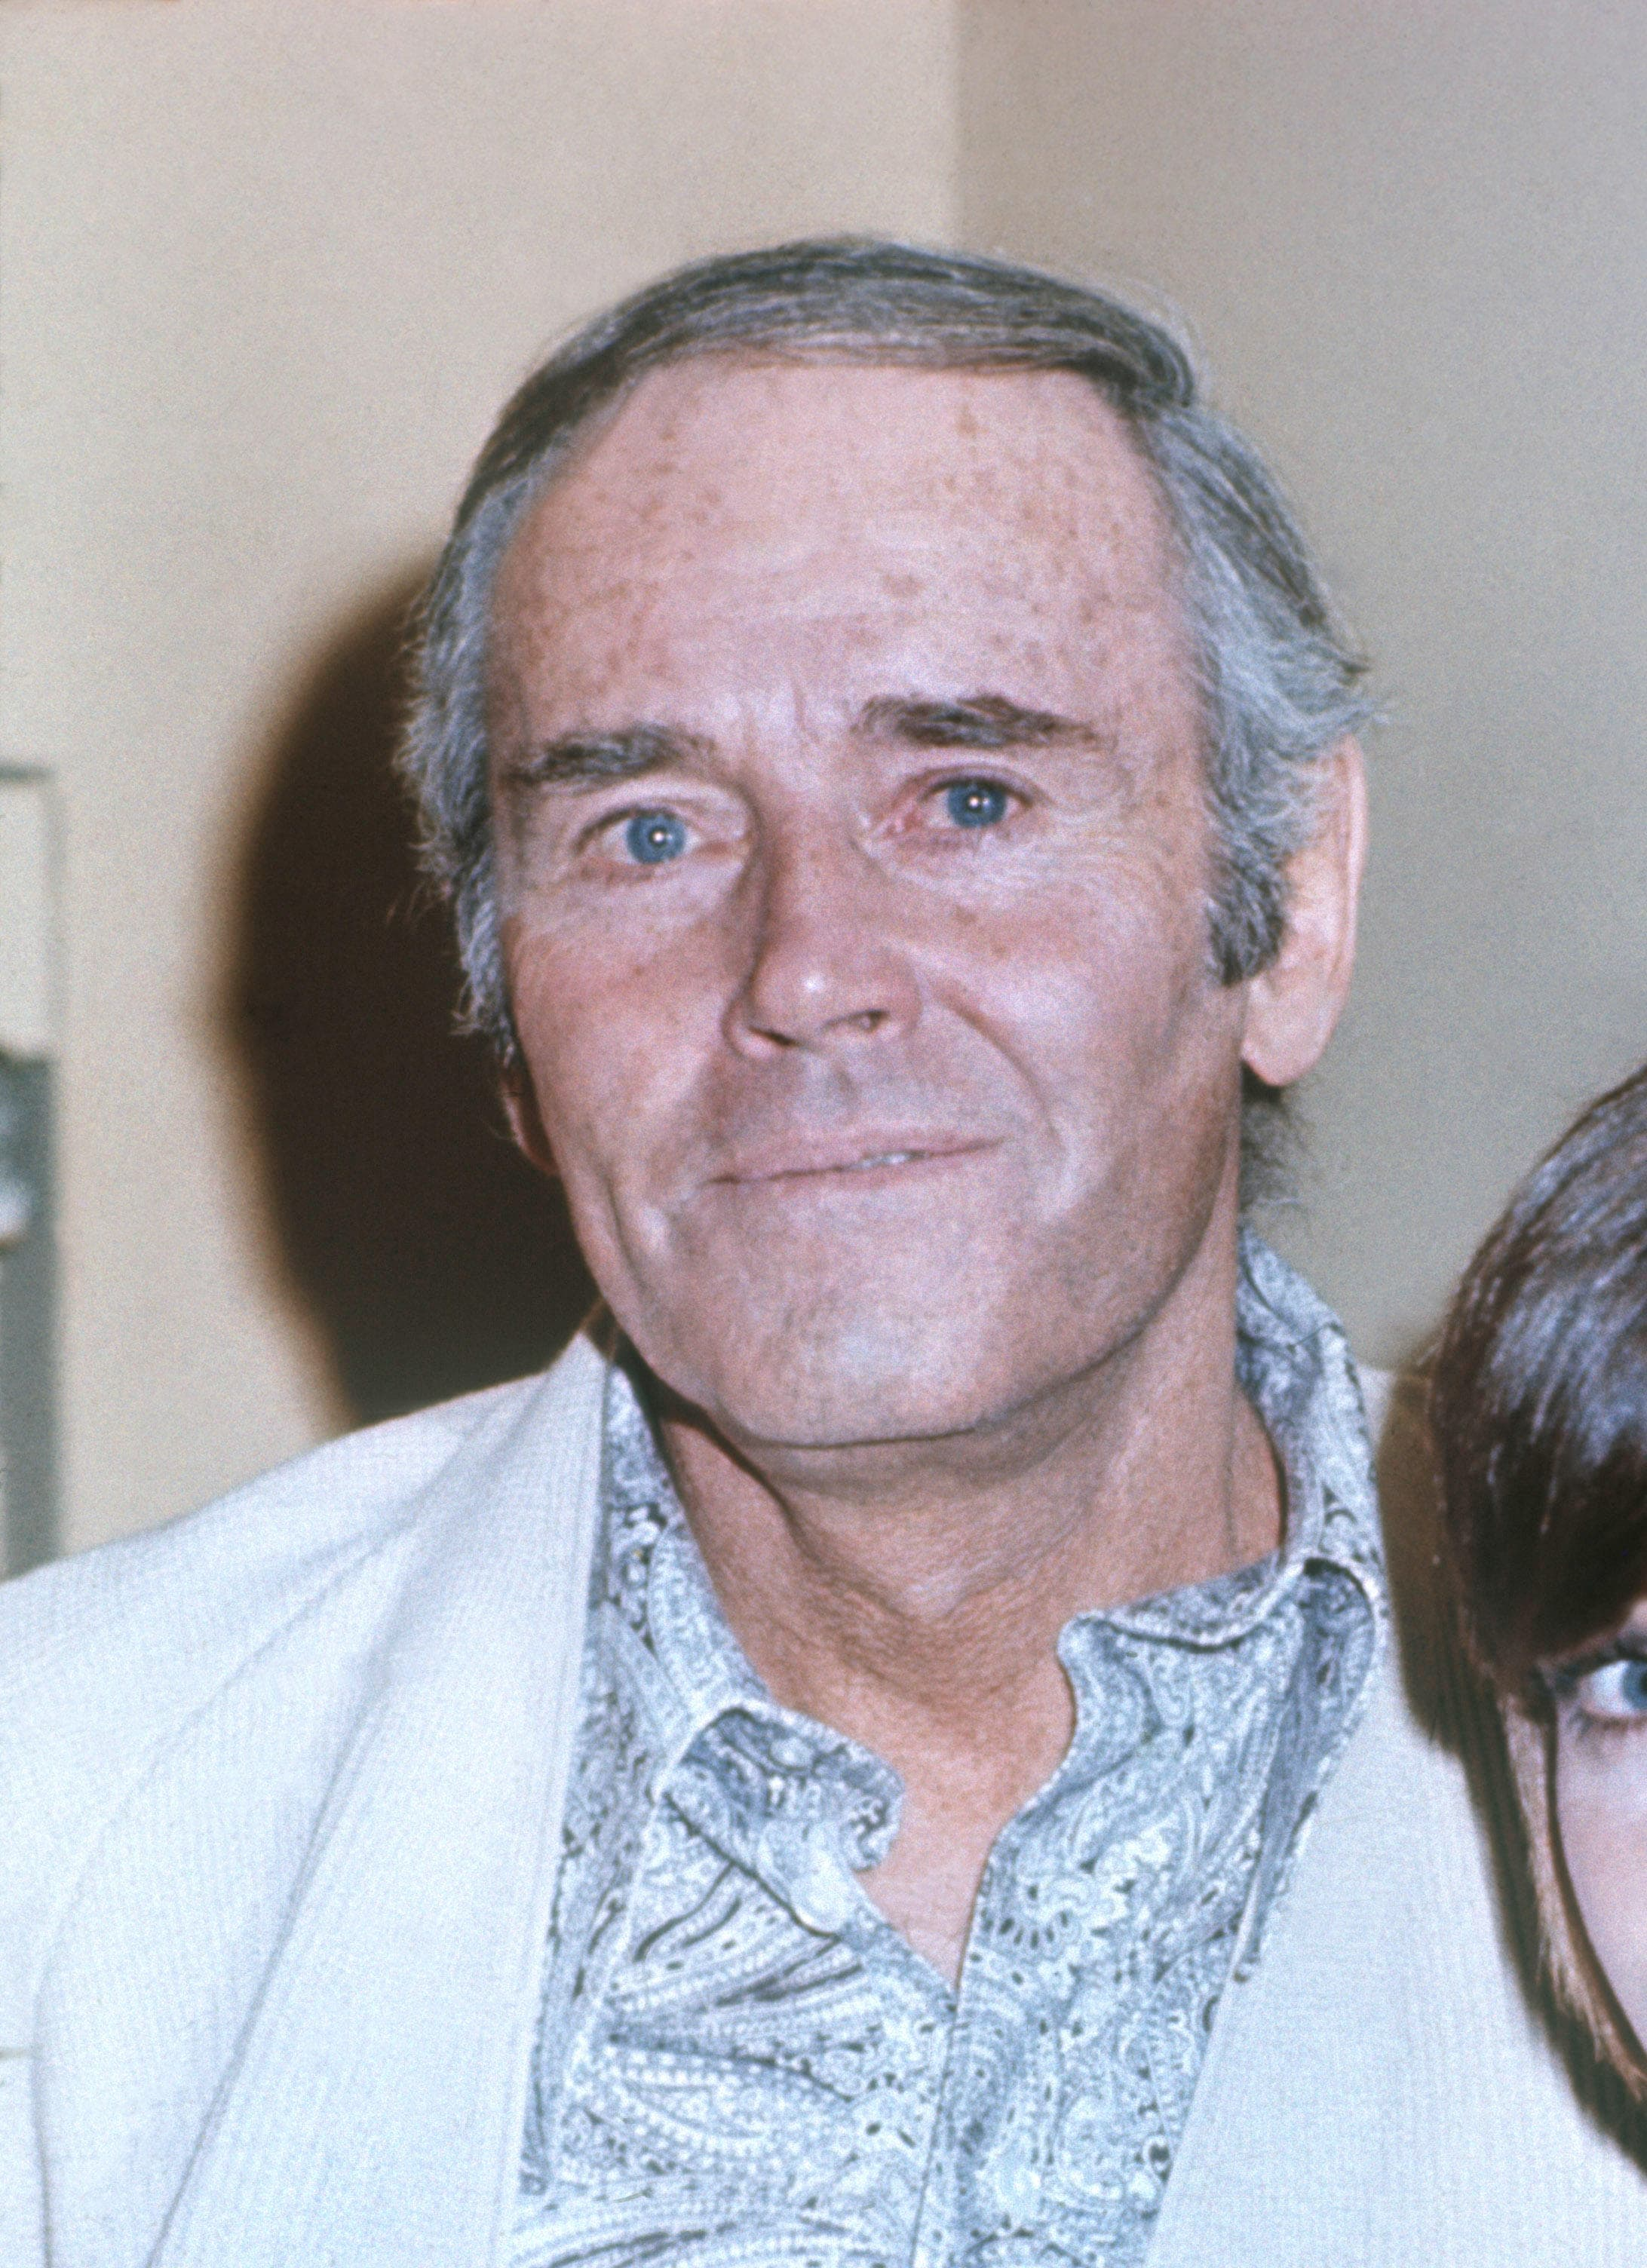 Henry Fonda Wallpapers hd